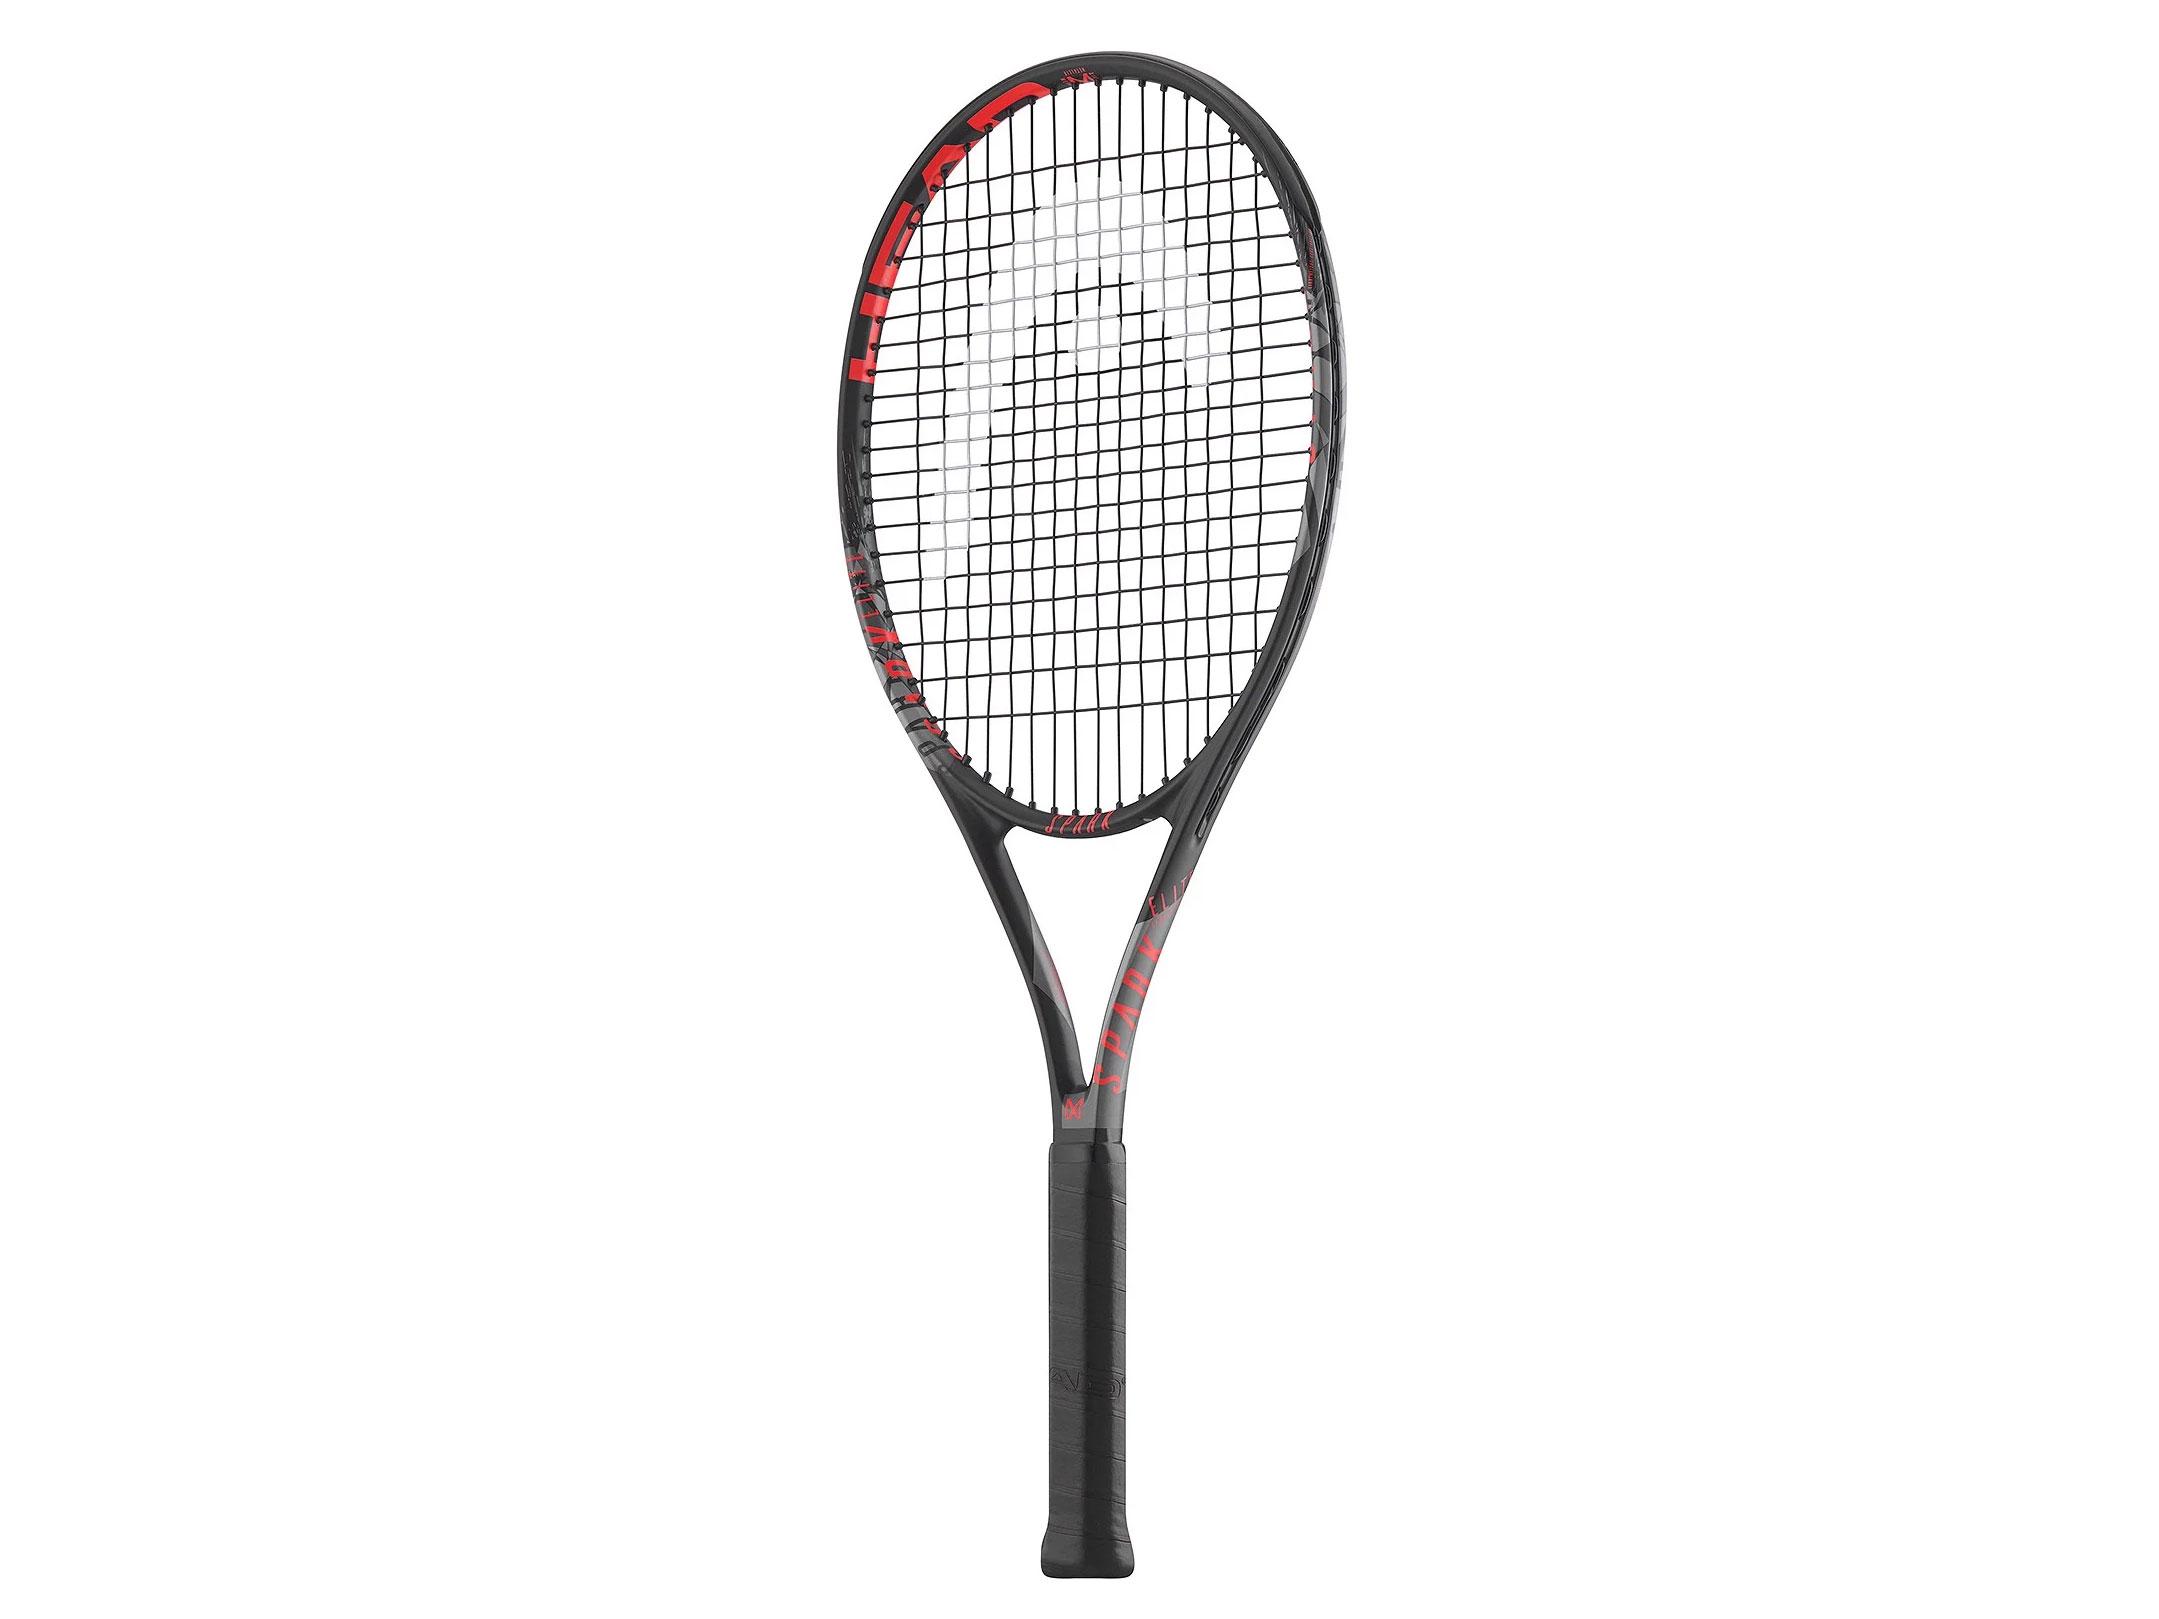 Vợt tennis MX Spark Elite màu đen